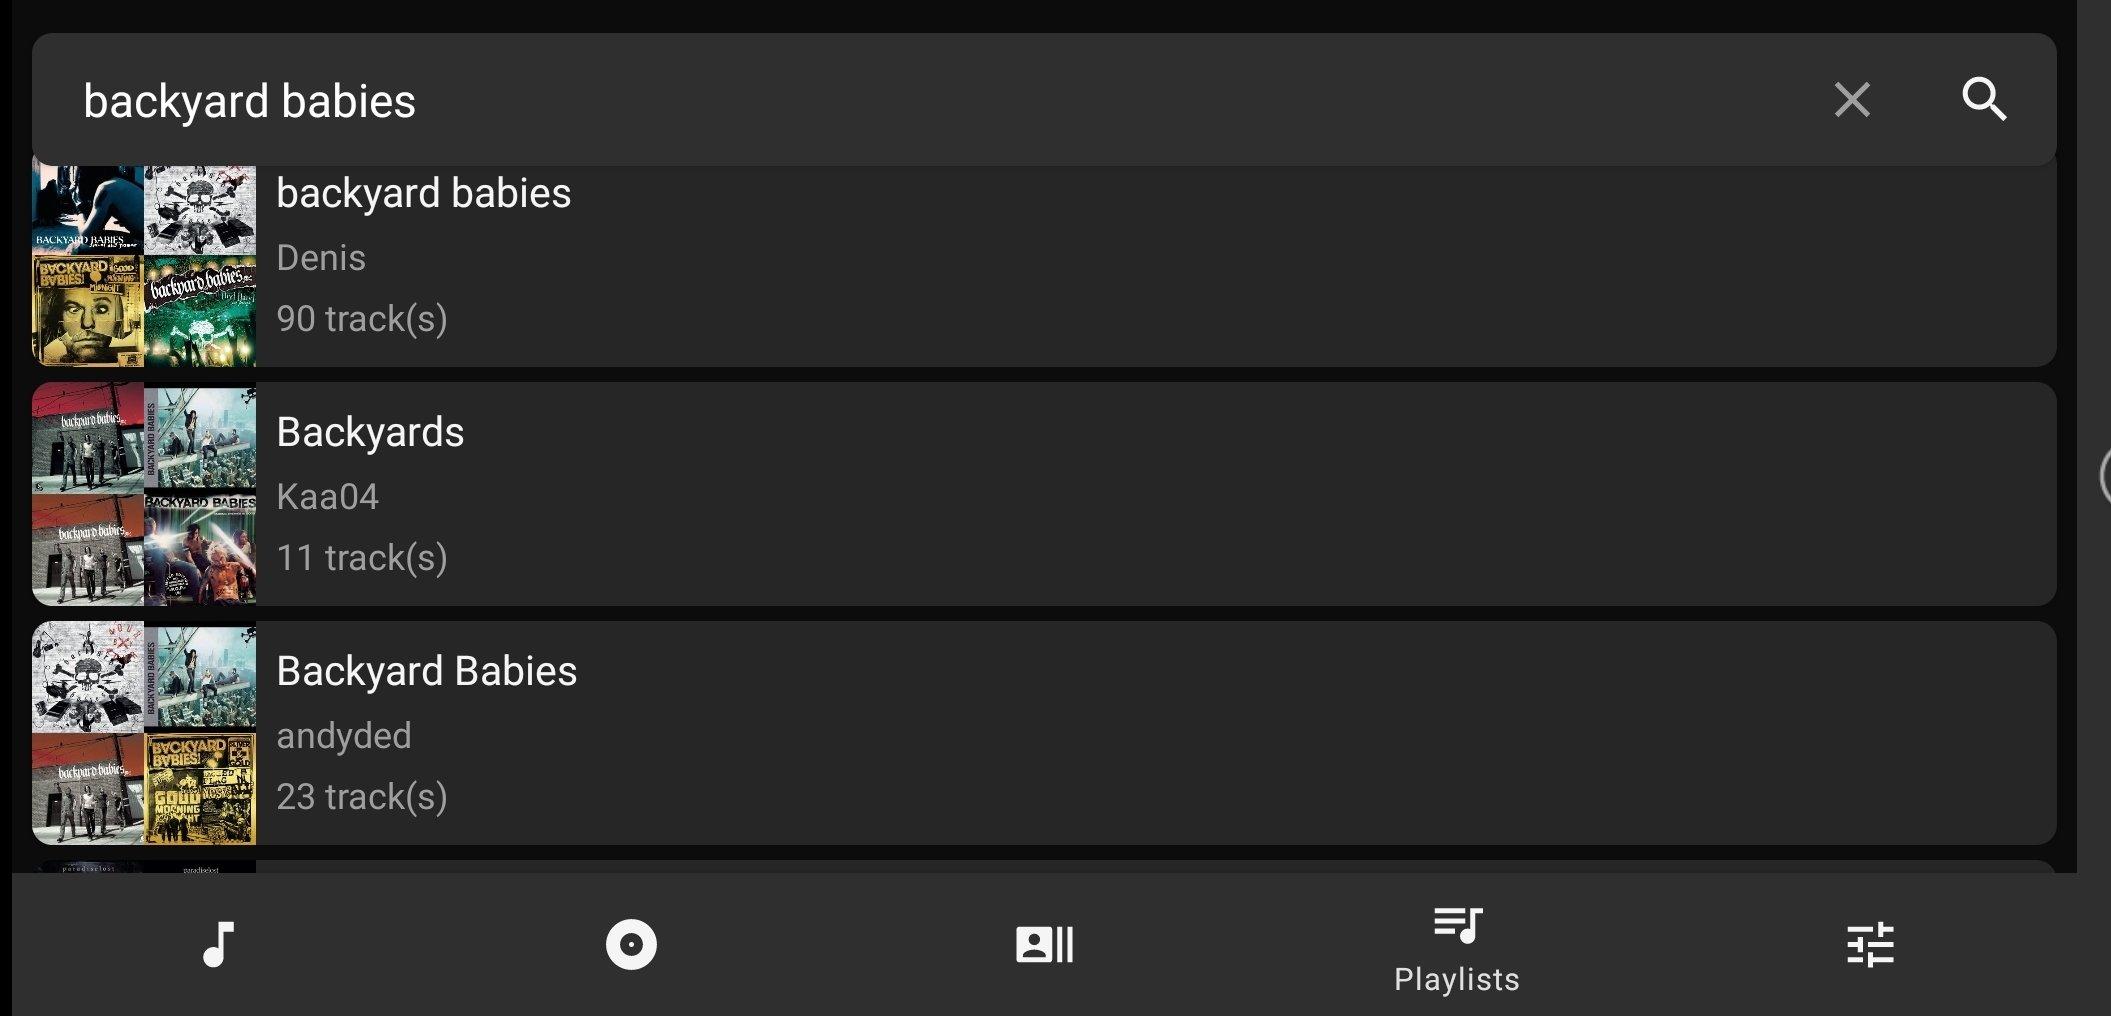 AIDS 1.058 - Descargar para Android APK Gratis